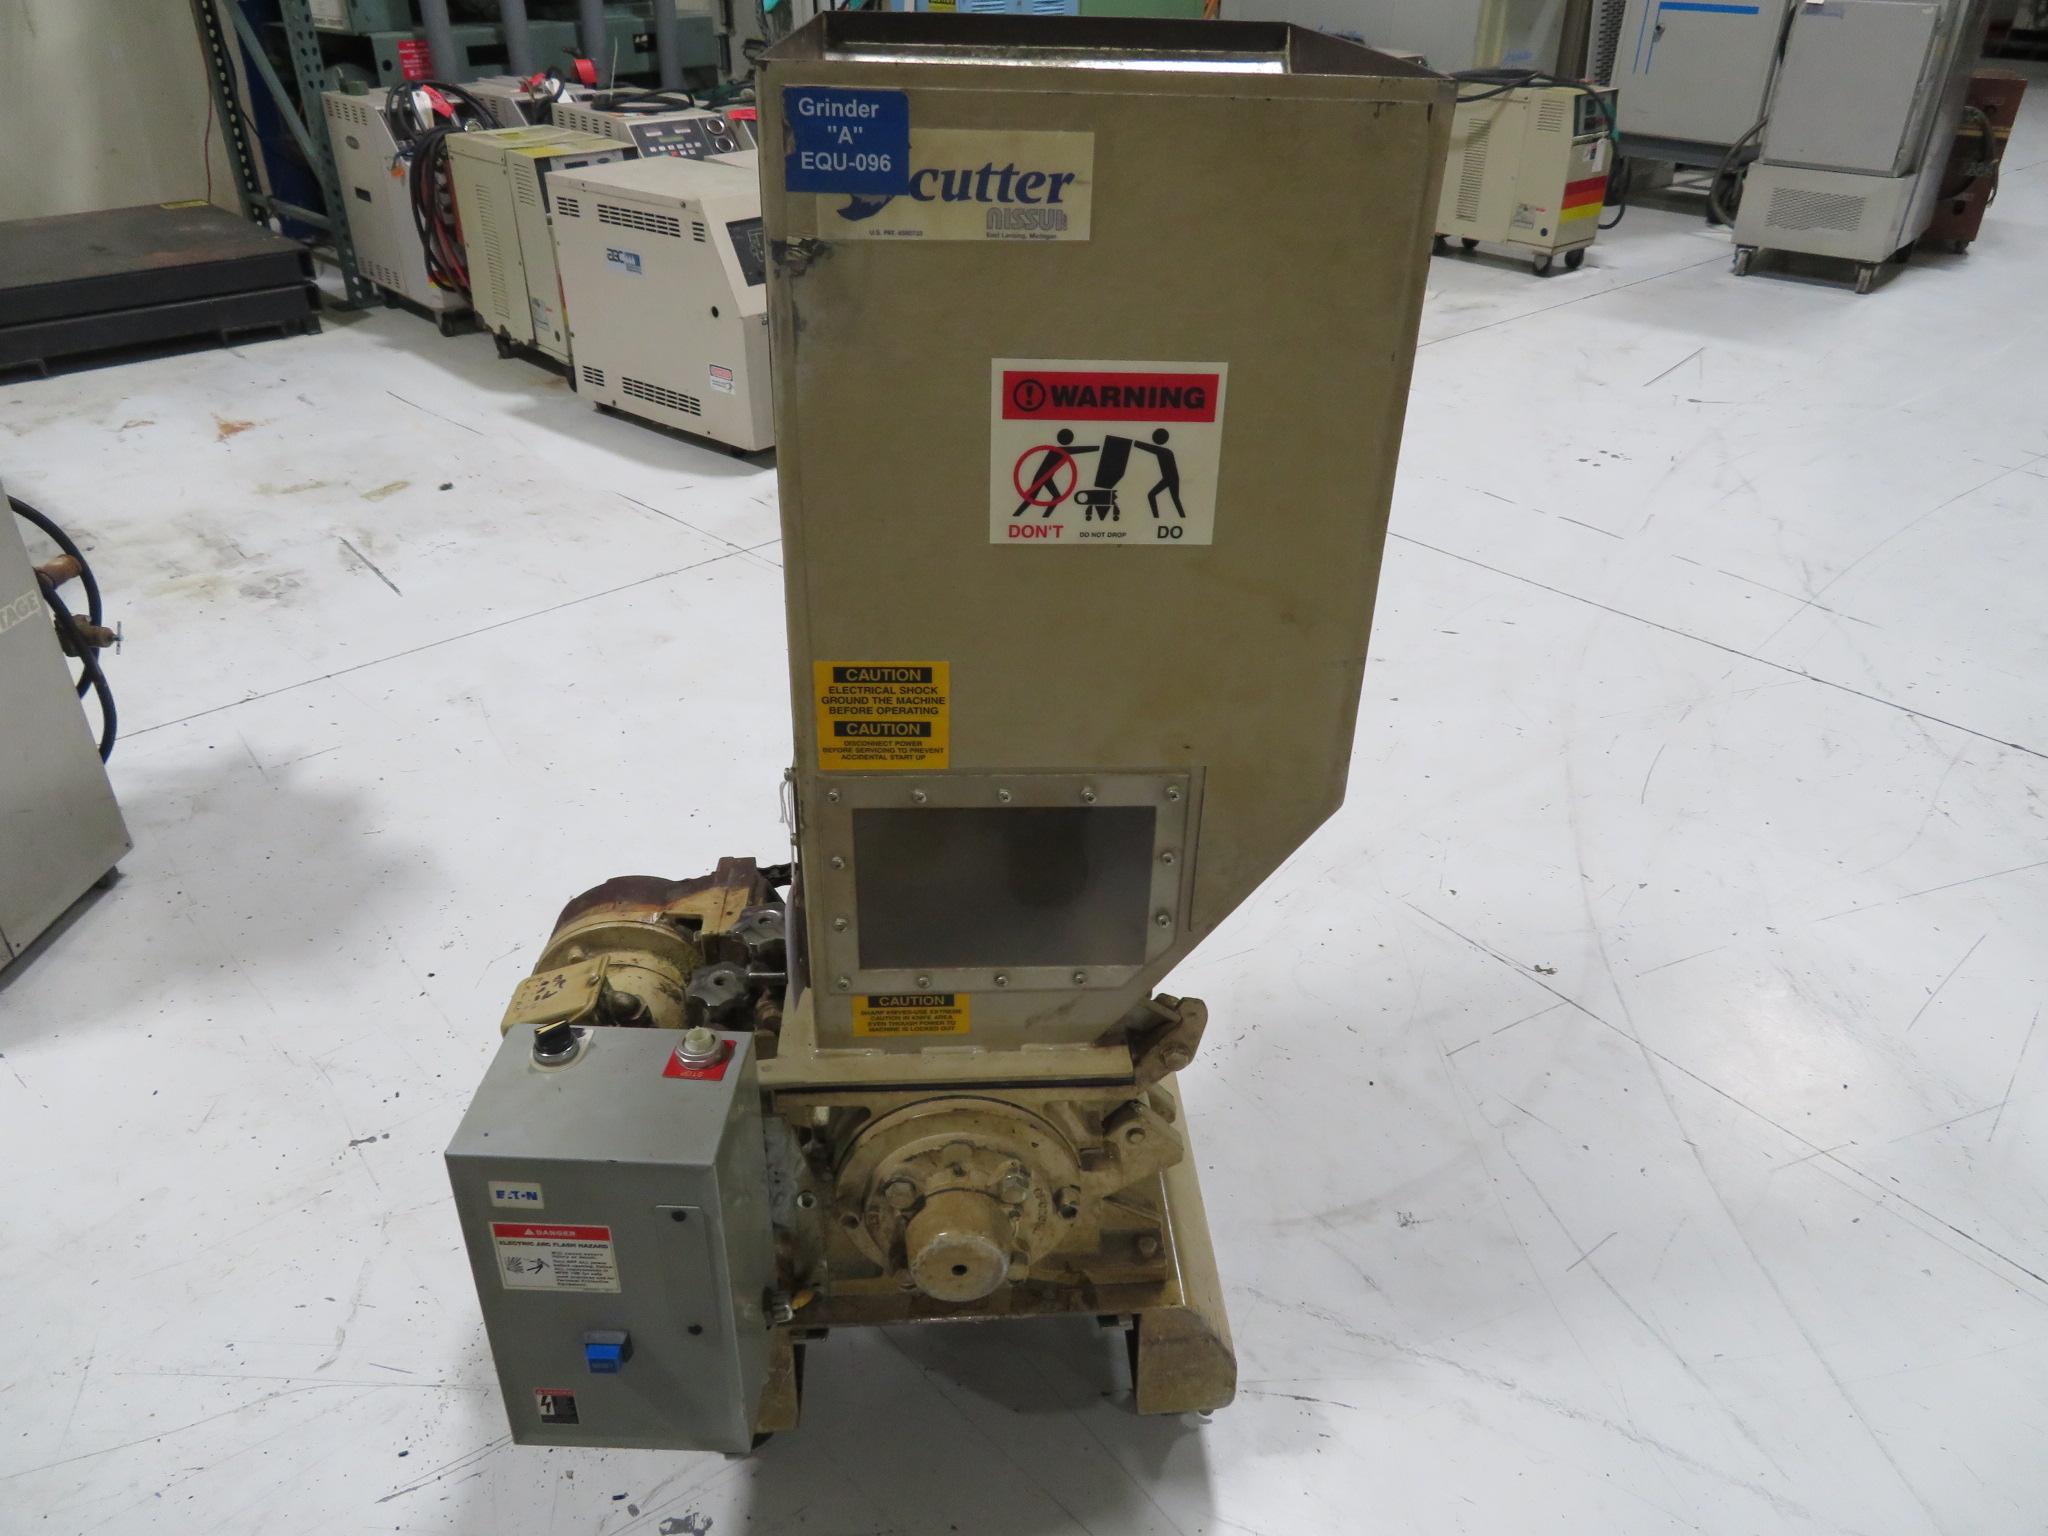 "Nissui FNSK-04E Used Granulator, 19"" x 16"", 1hp, 460V, Yr. 1993"